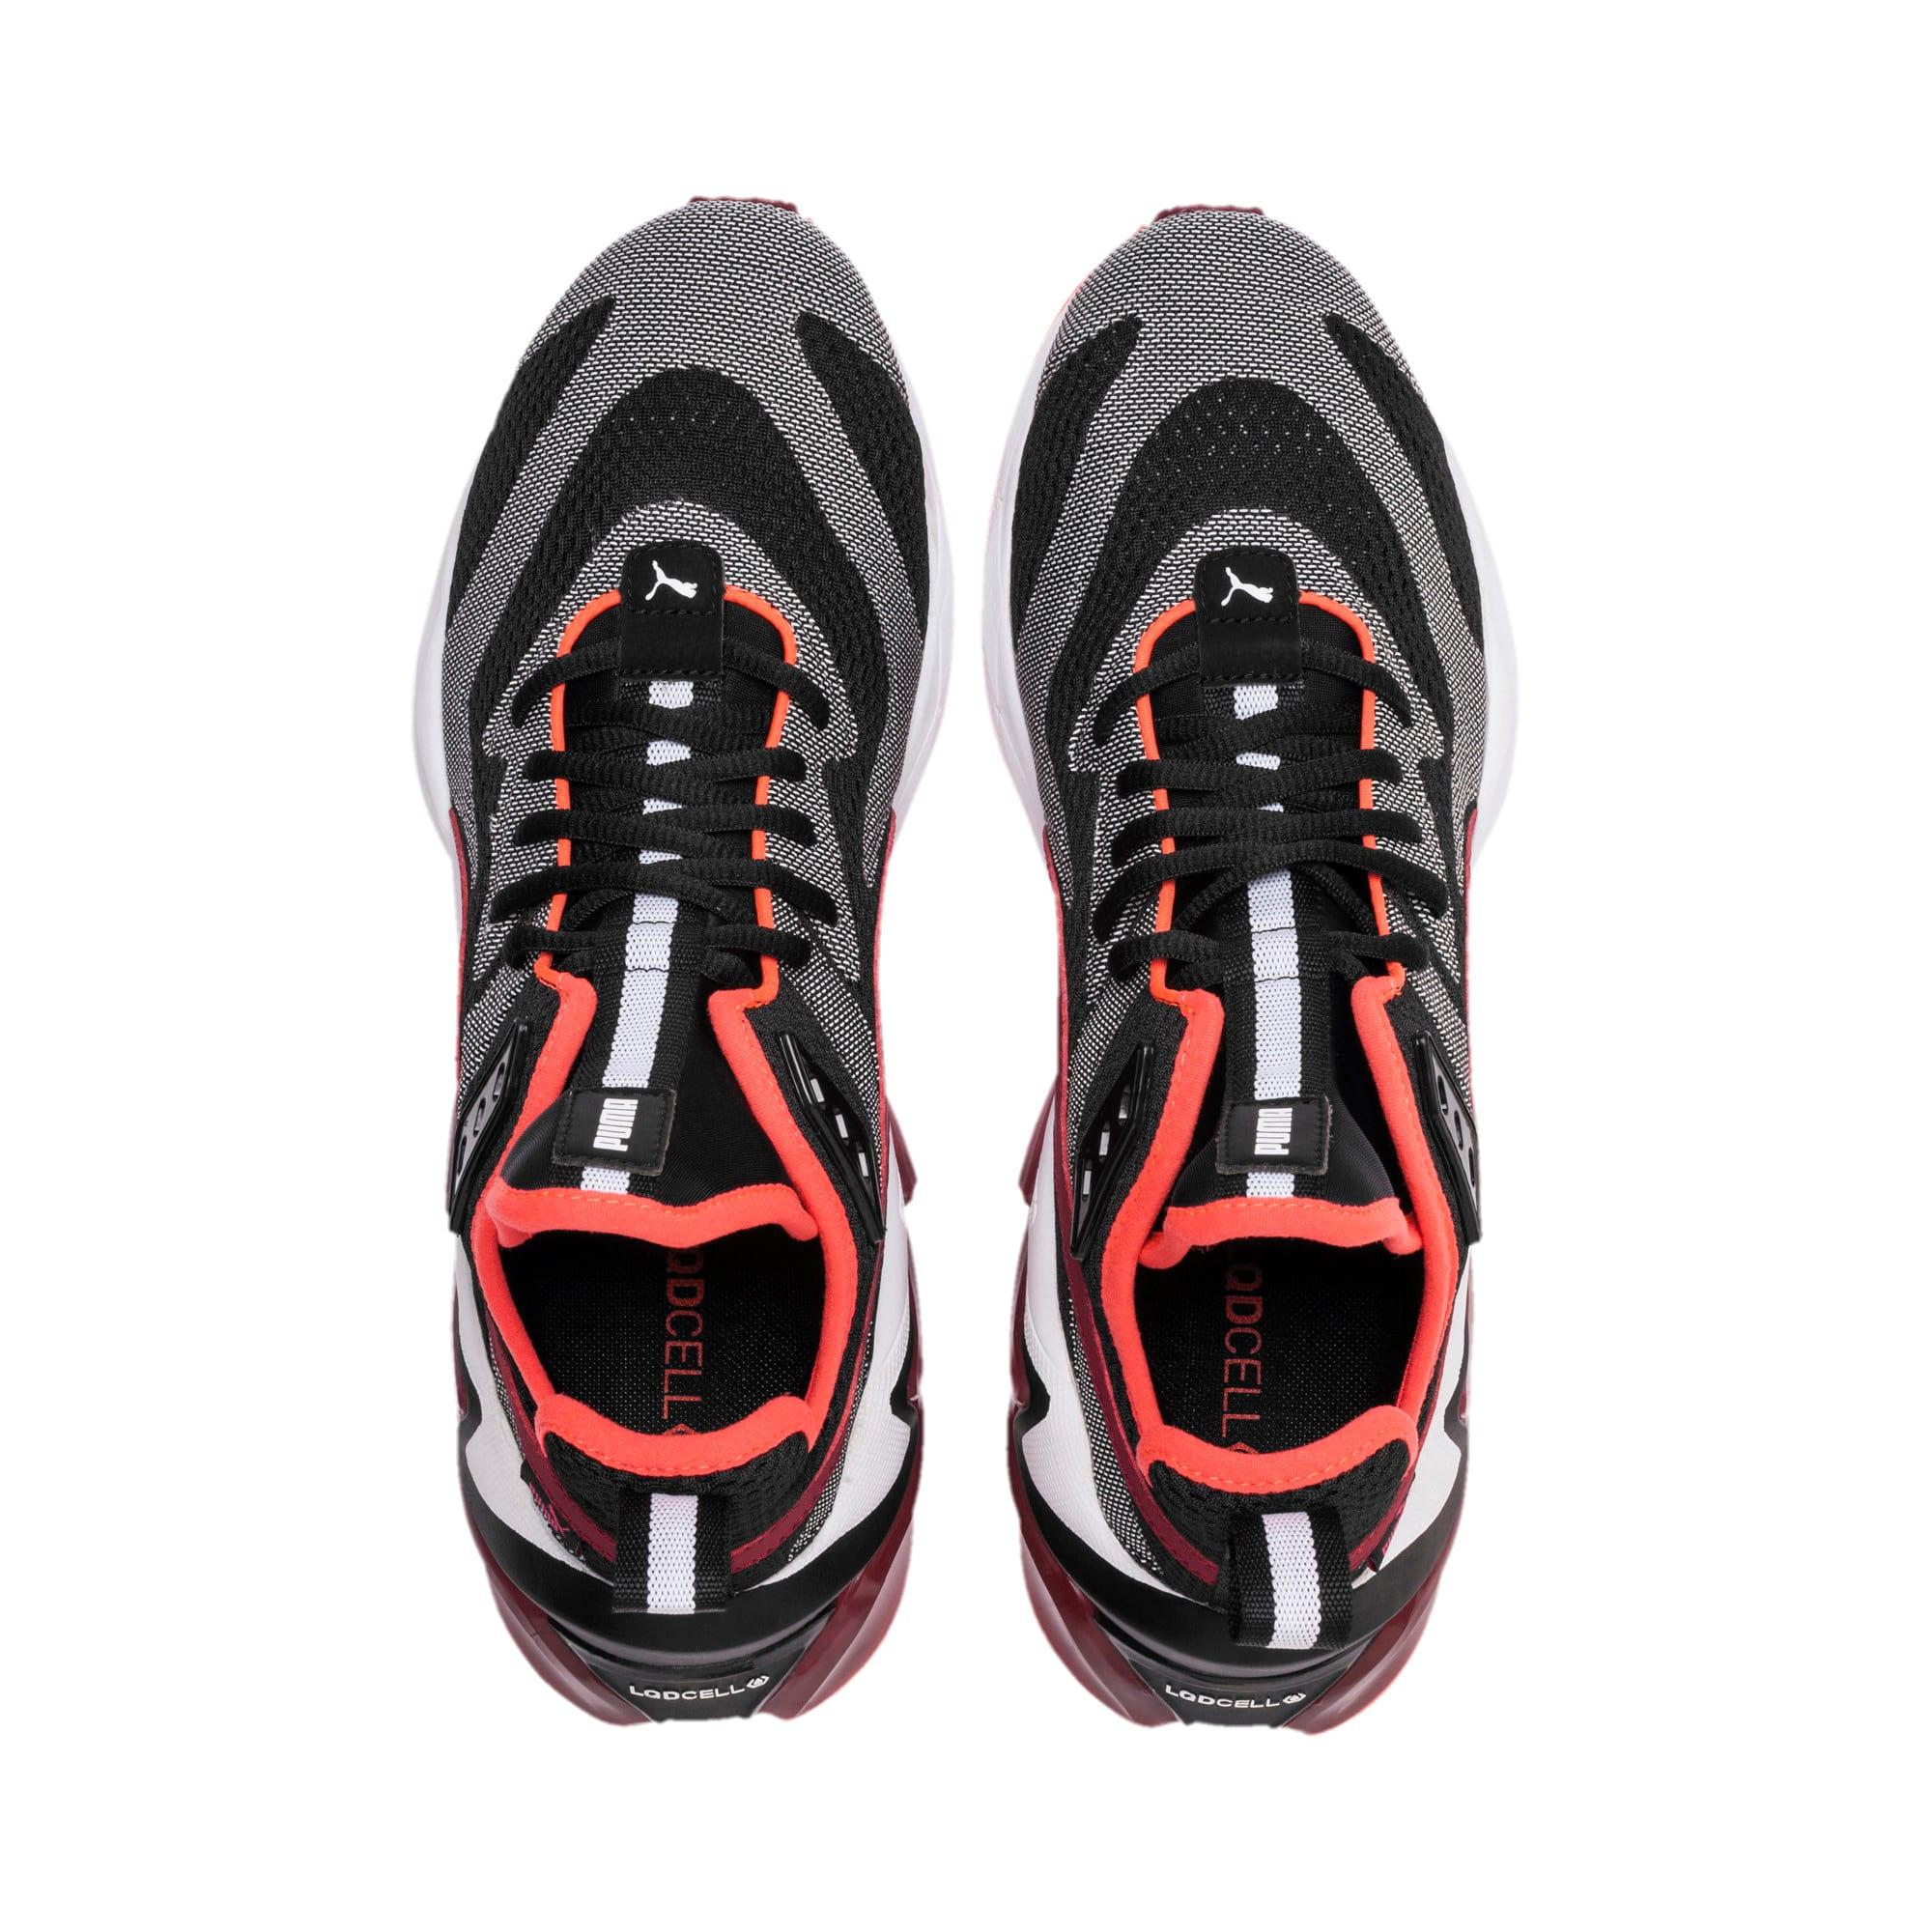 Thumbnail 7 of LQDCELL Origin Tech Men's Shoes, Puma Black-Rhubarb, medium